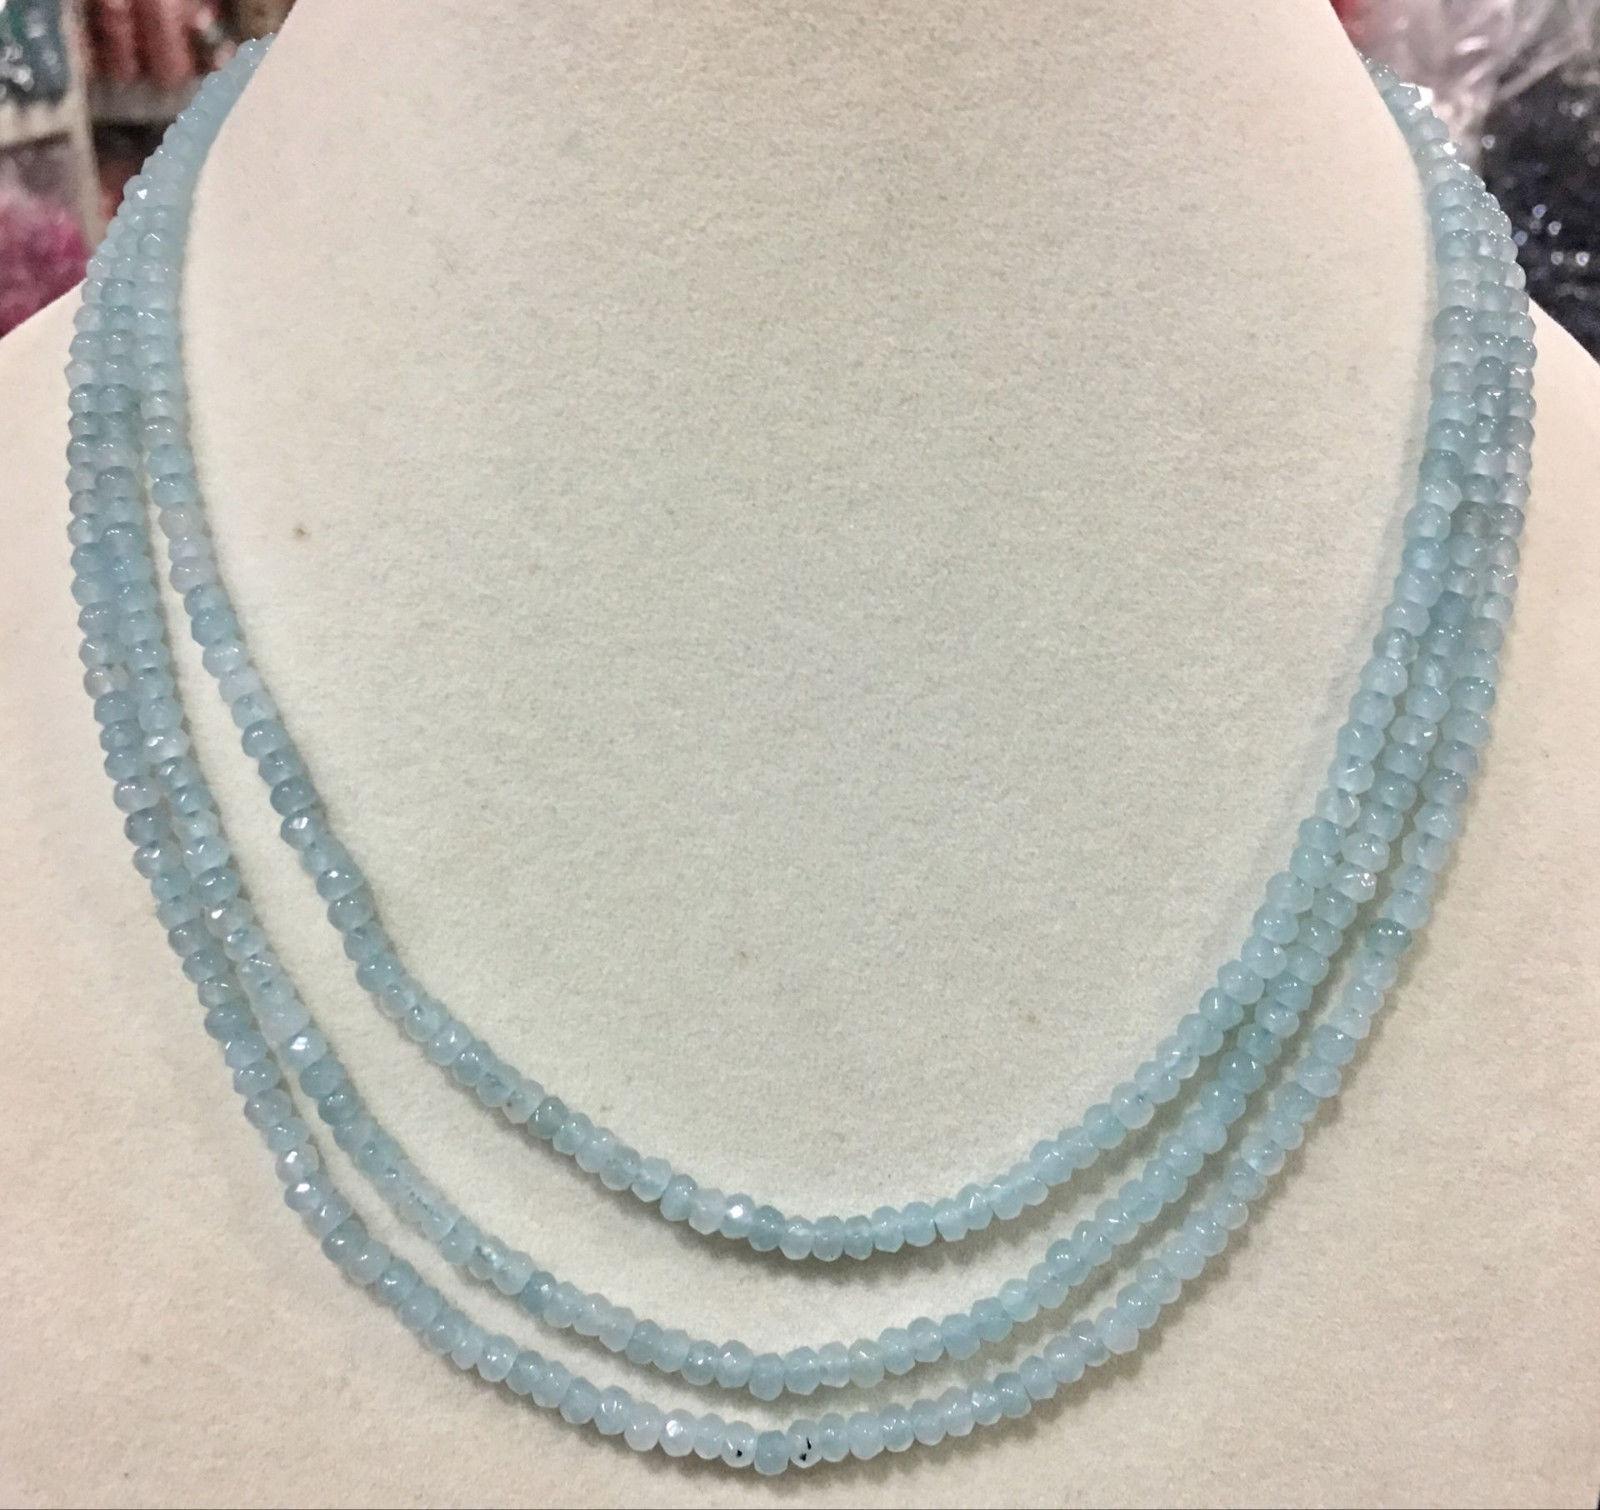 "Genuine natural 3 row 2X4 mm facial aquamarine Roundel bead necklace 17-19"""